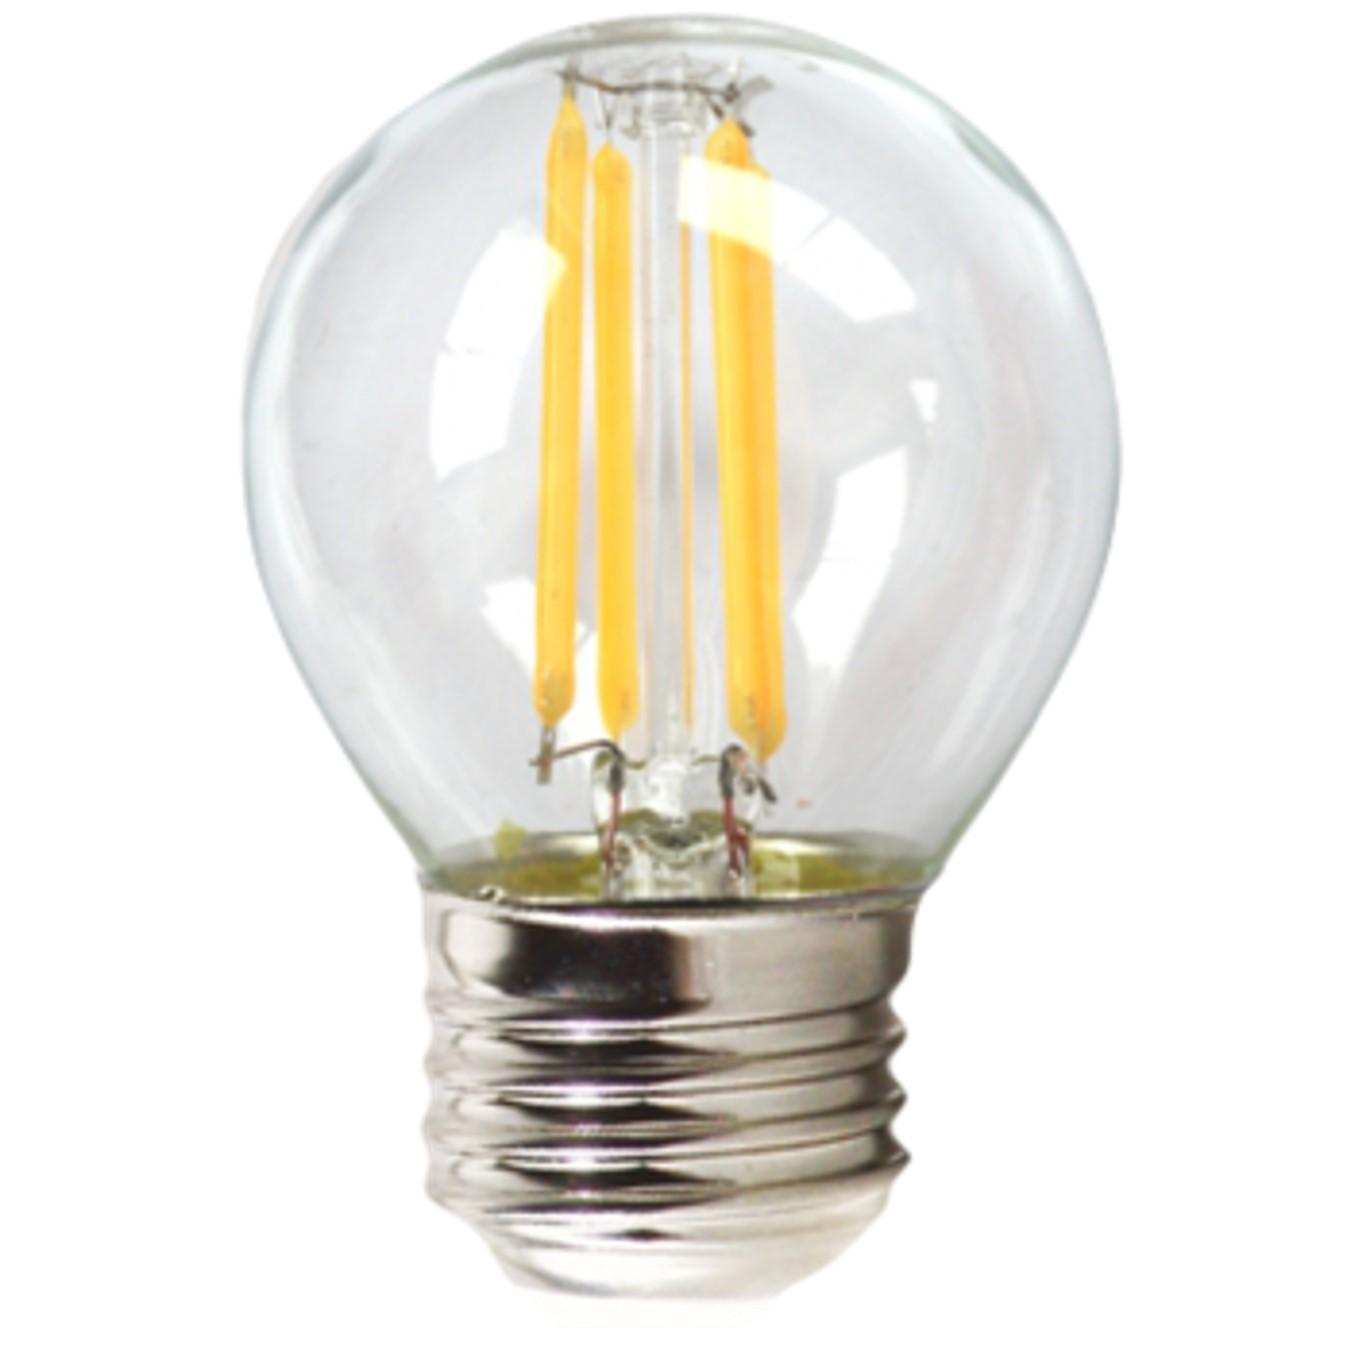 Bombilla led silver electronic filamento transparente esferica 4w=60w -  e27 -  3000k luz calida -  a++